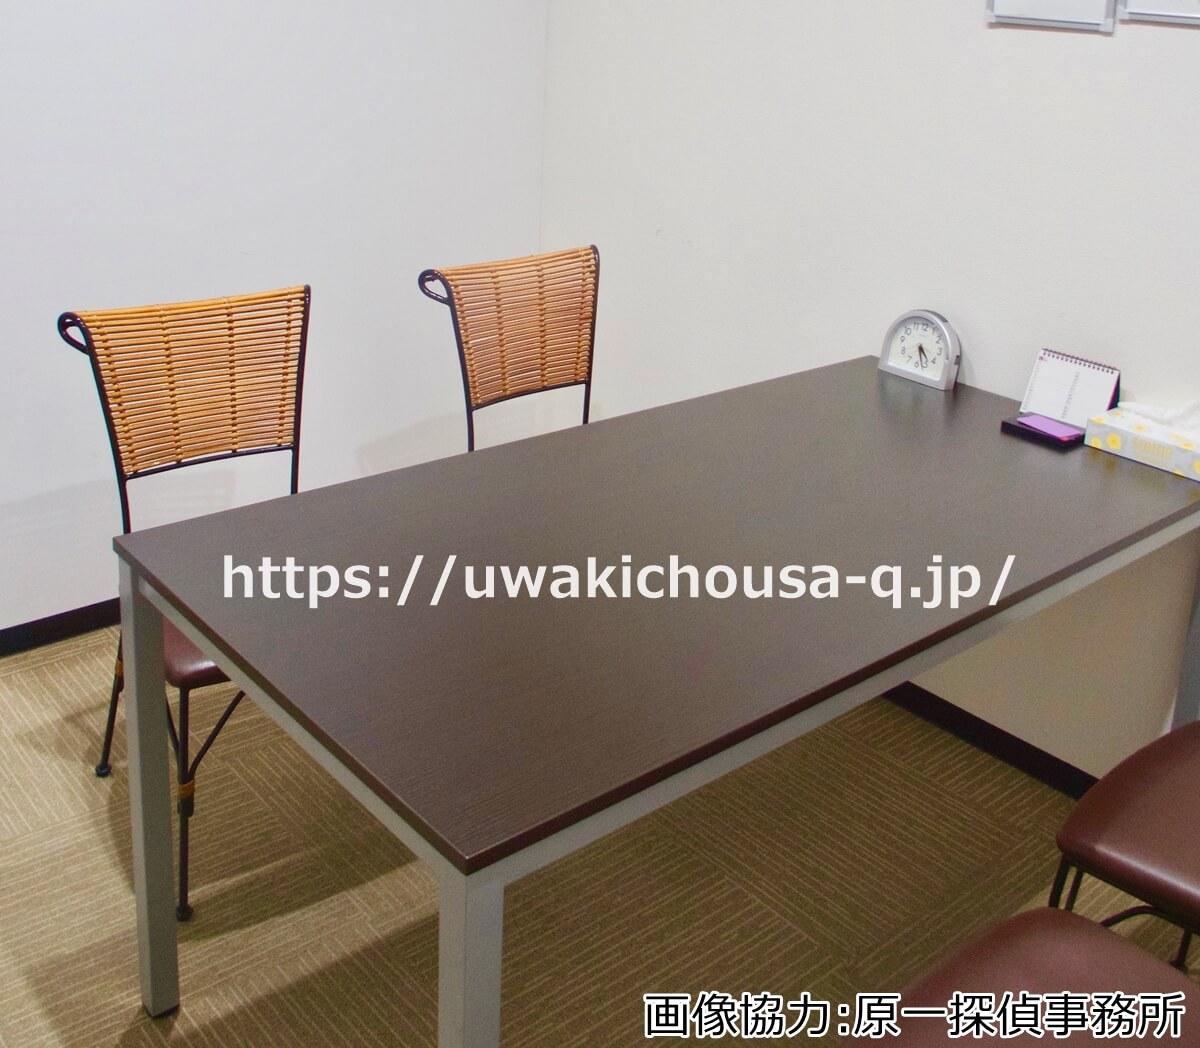 探偵事務所・興信所の相談室